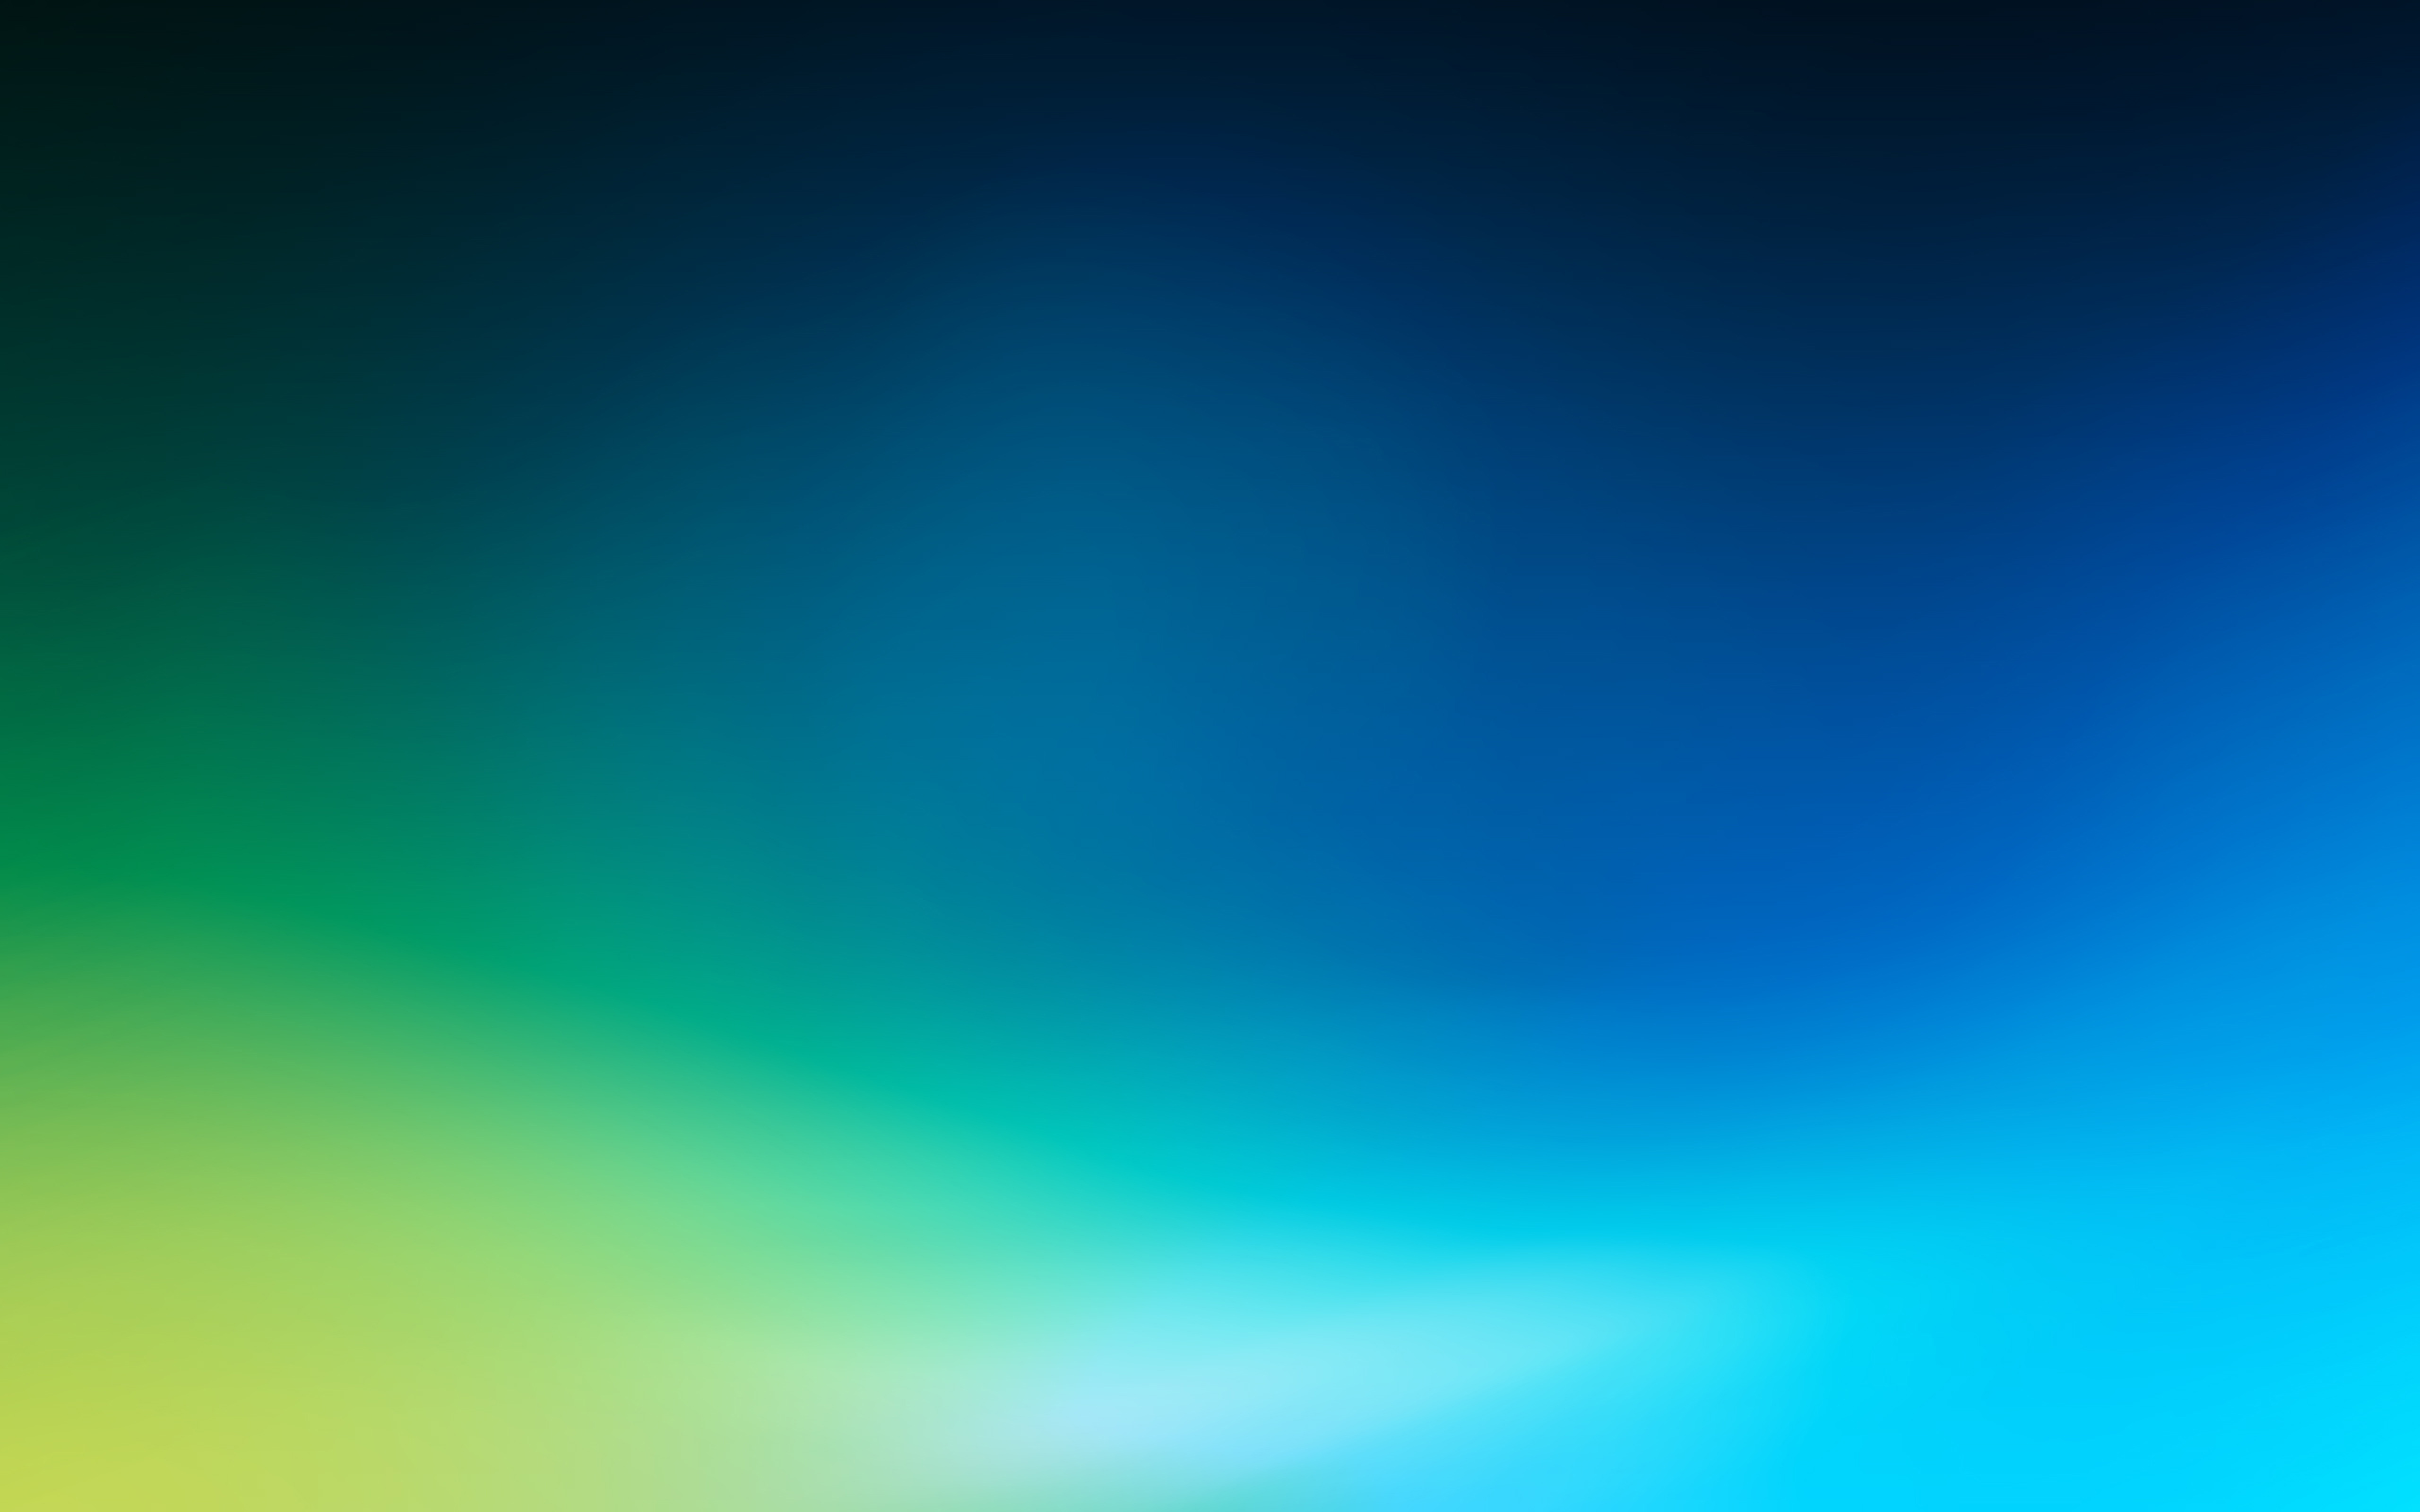 BL enjoyable by nanatrex, relaxation, relax, wallpaper, abstract, digital art, simple, blur